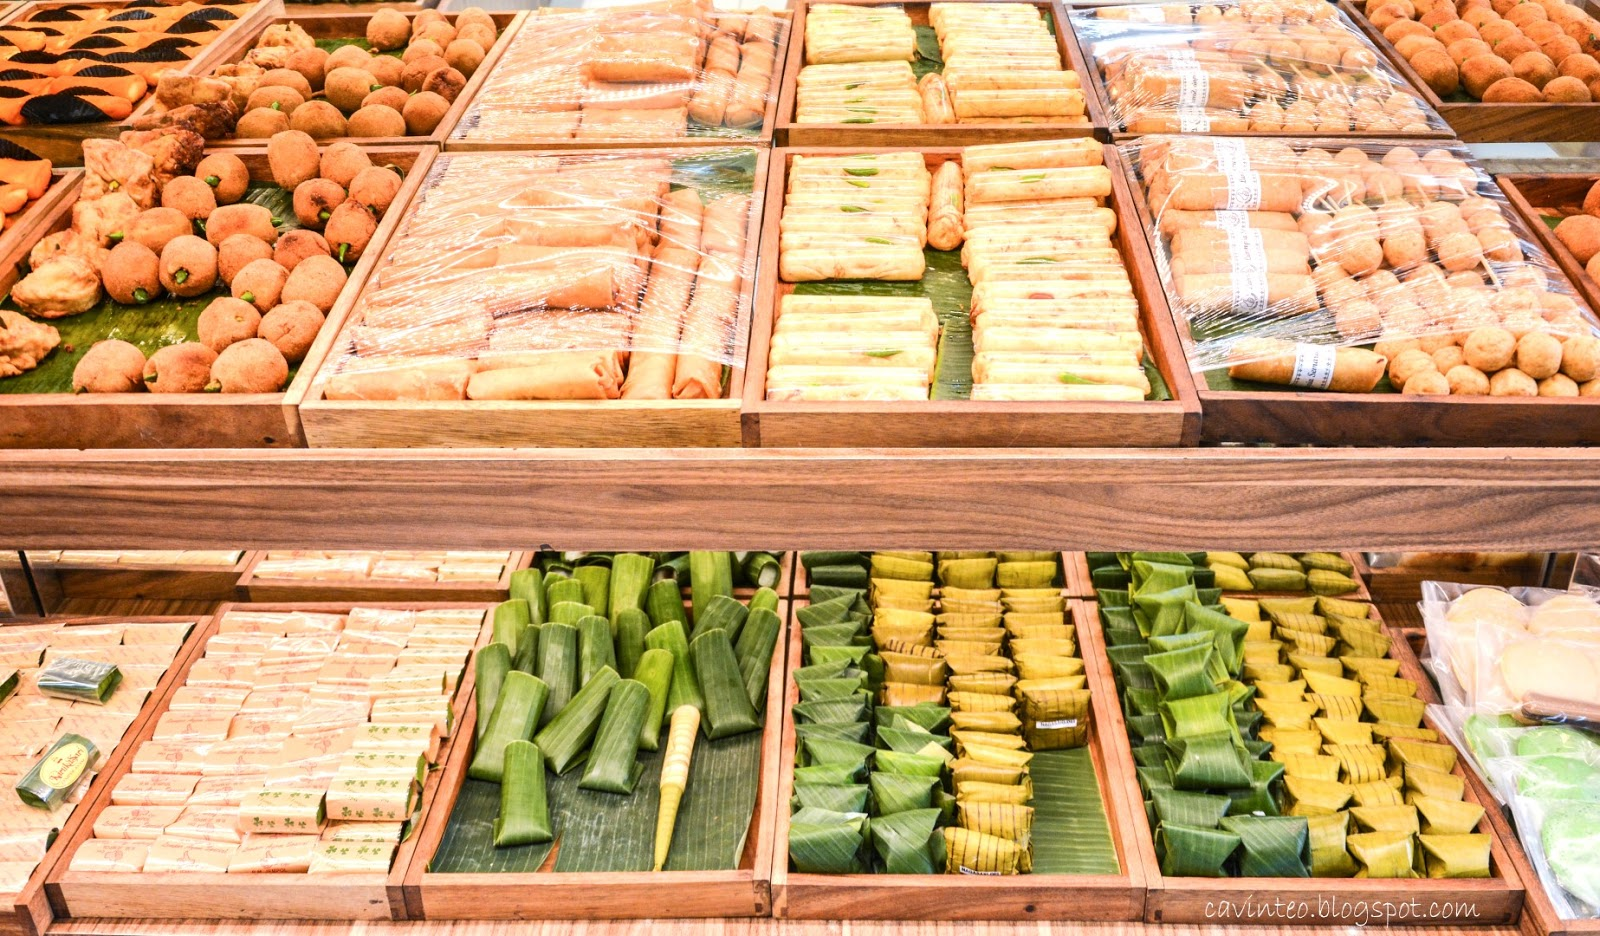 Entree Kibbles Kartika Sari Dago Branch More Food Souvenirs To Kuliner  Pisang By Minar Production Bdg 03 3859 28dago Branch29 Bring Home3b Just Like Bengawan Solo 40 Bandung 5bindonesia5d 28large29